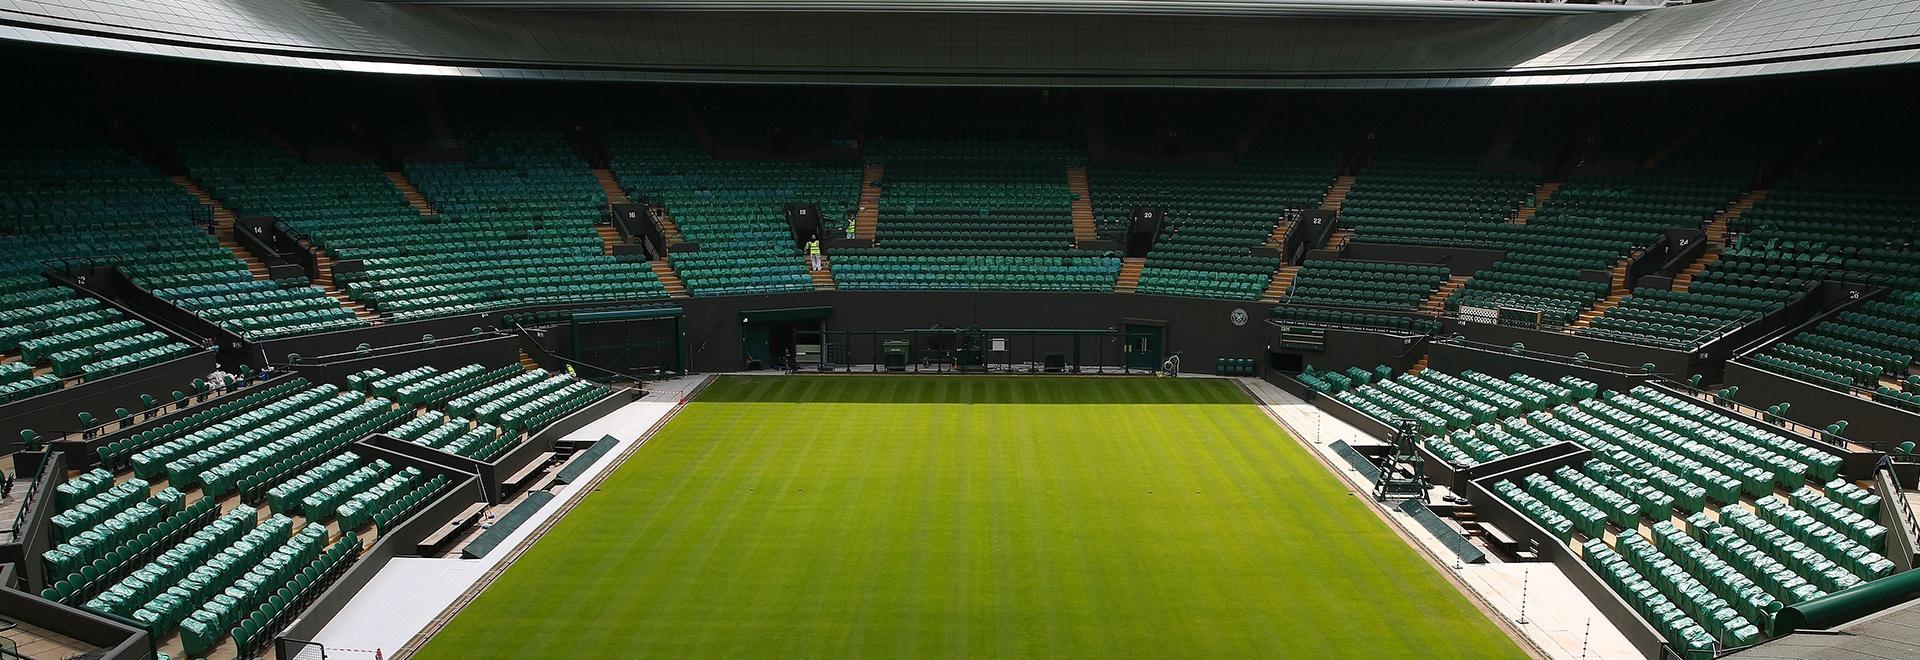 Wimbledon 2018: Anderson - Djokovic. Finale M